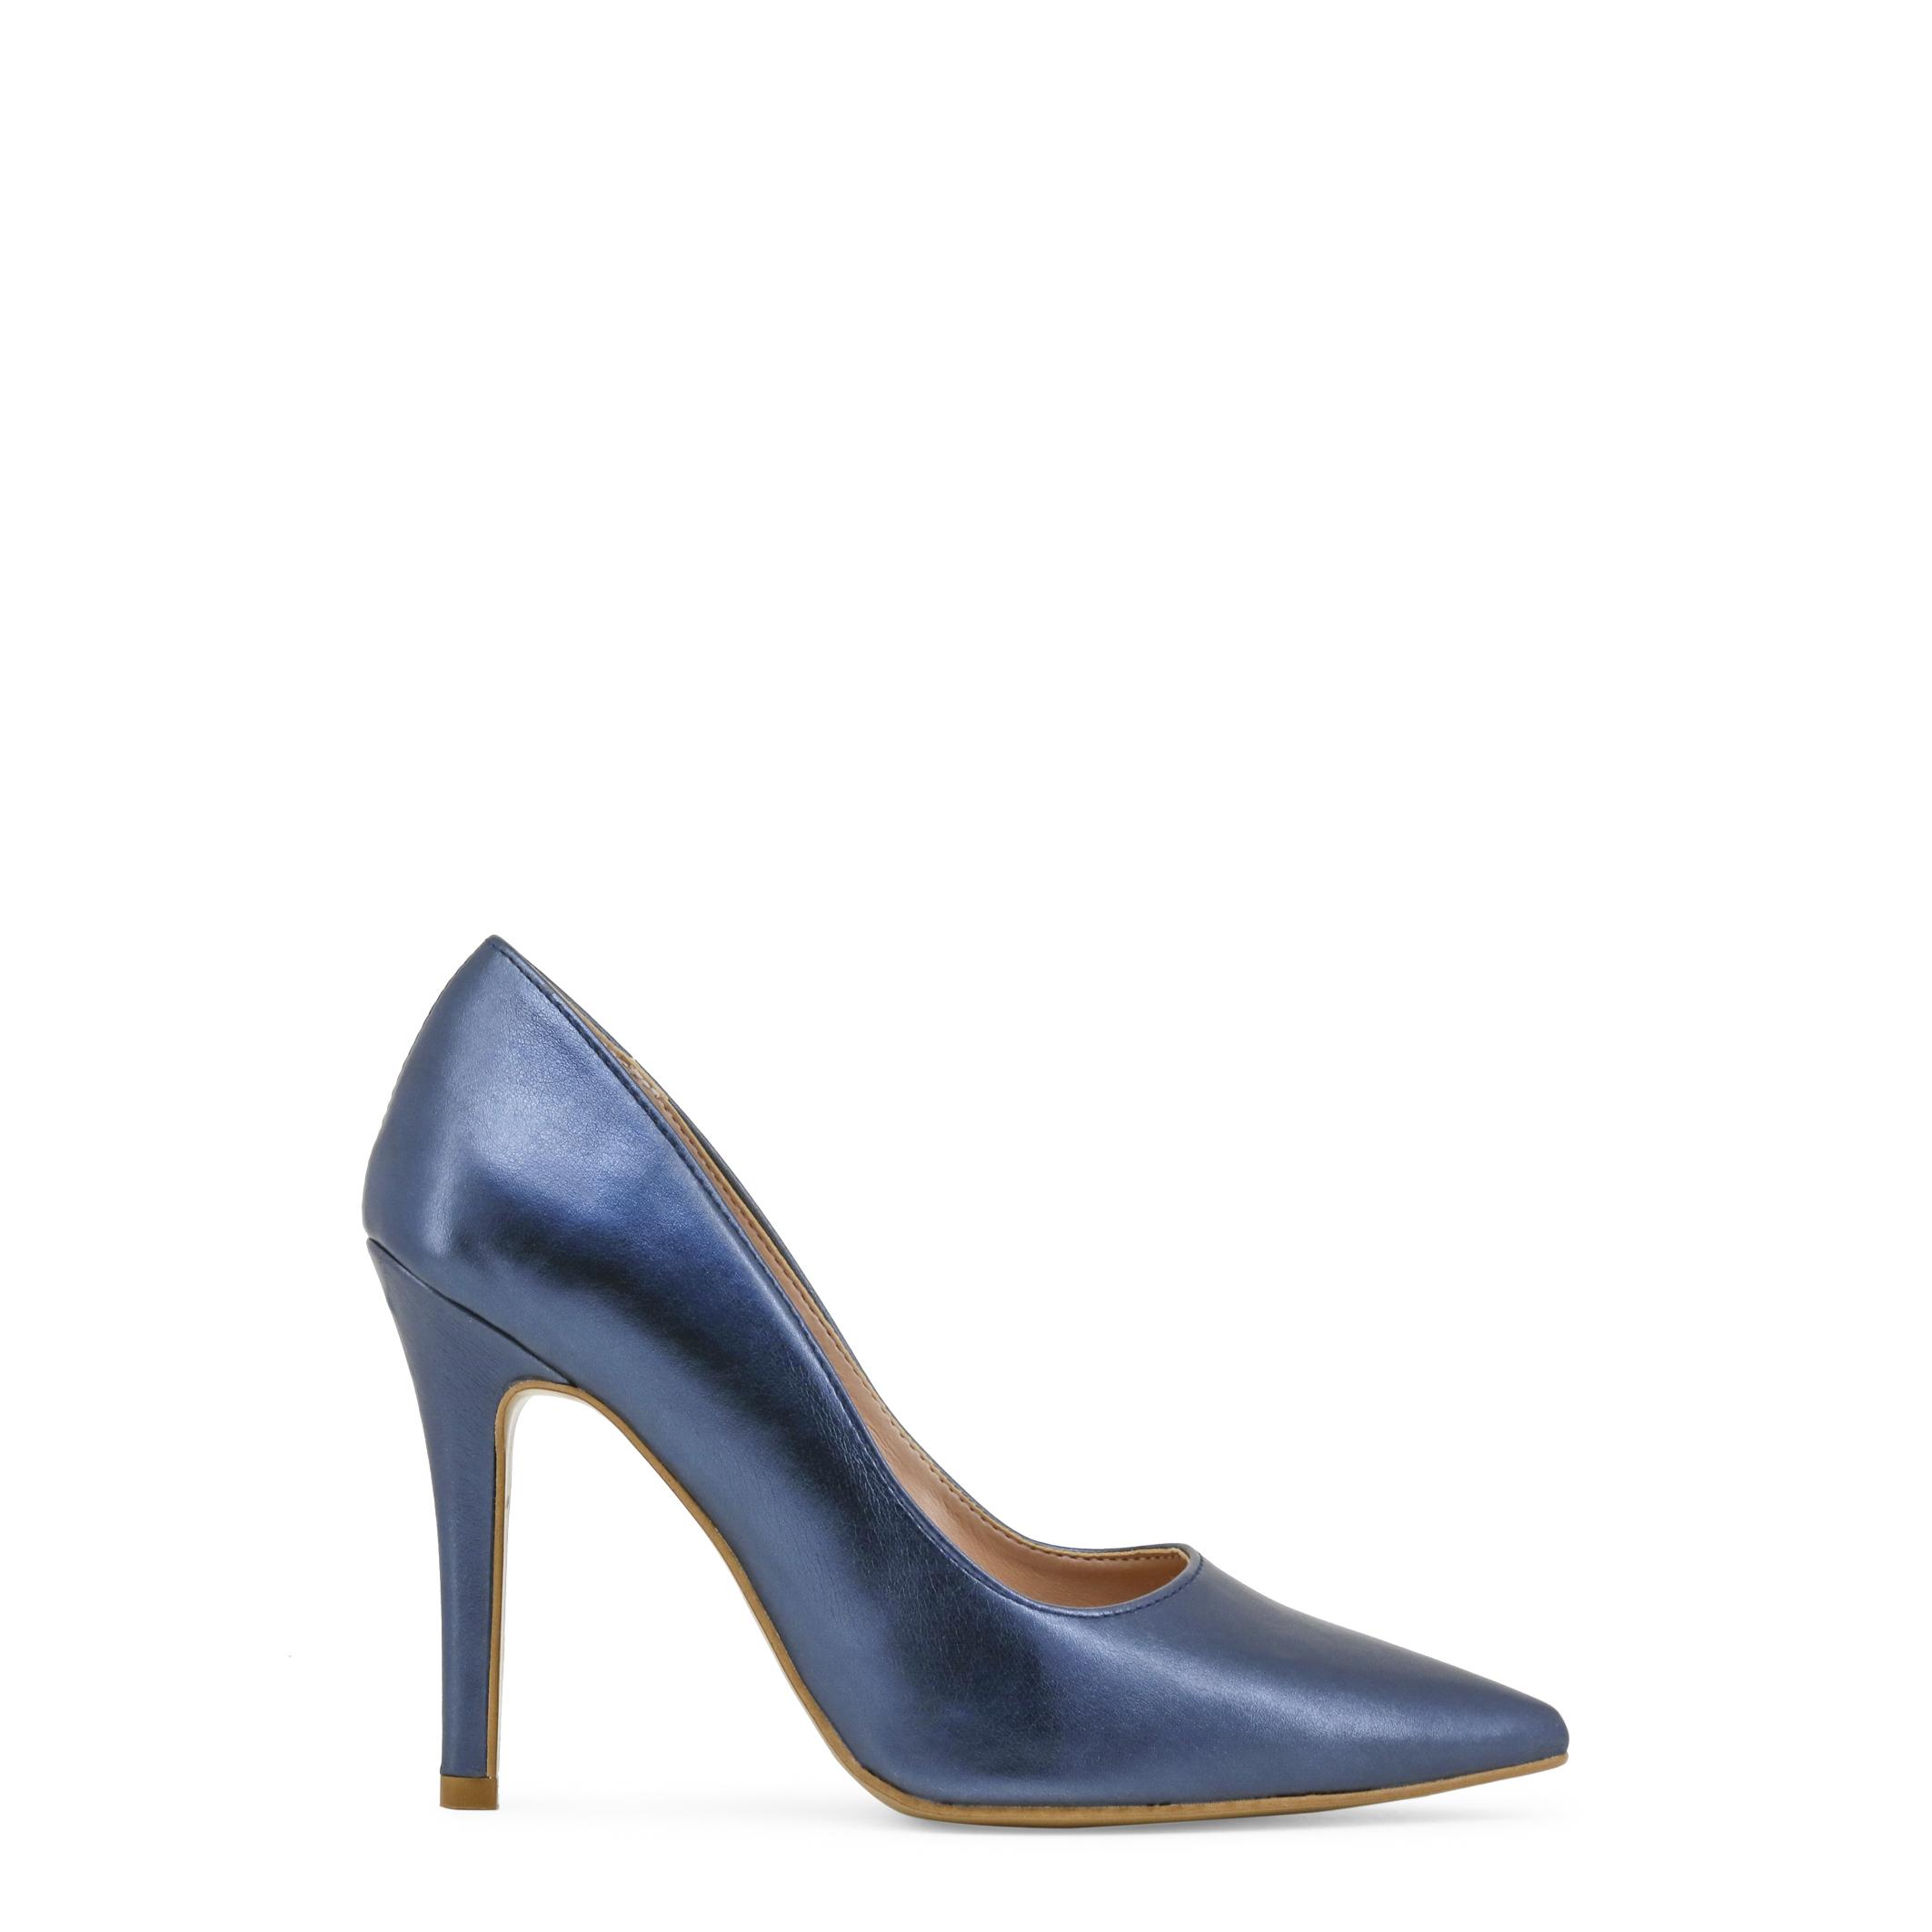 damen high heels paris hilton blau 38